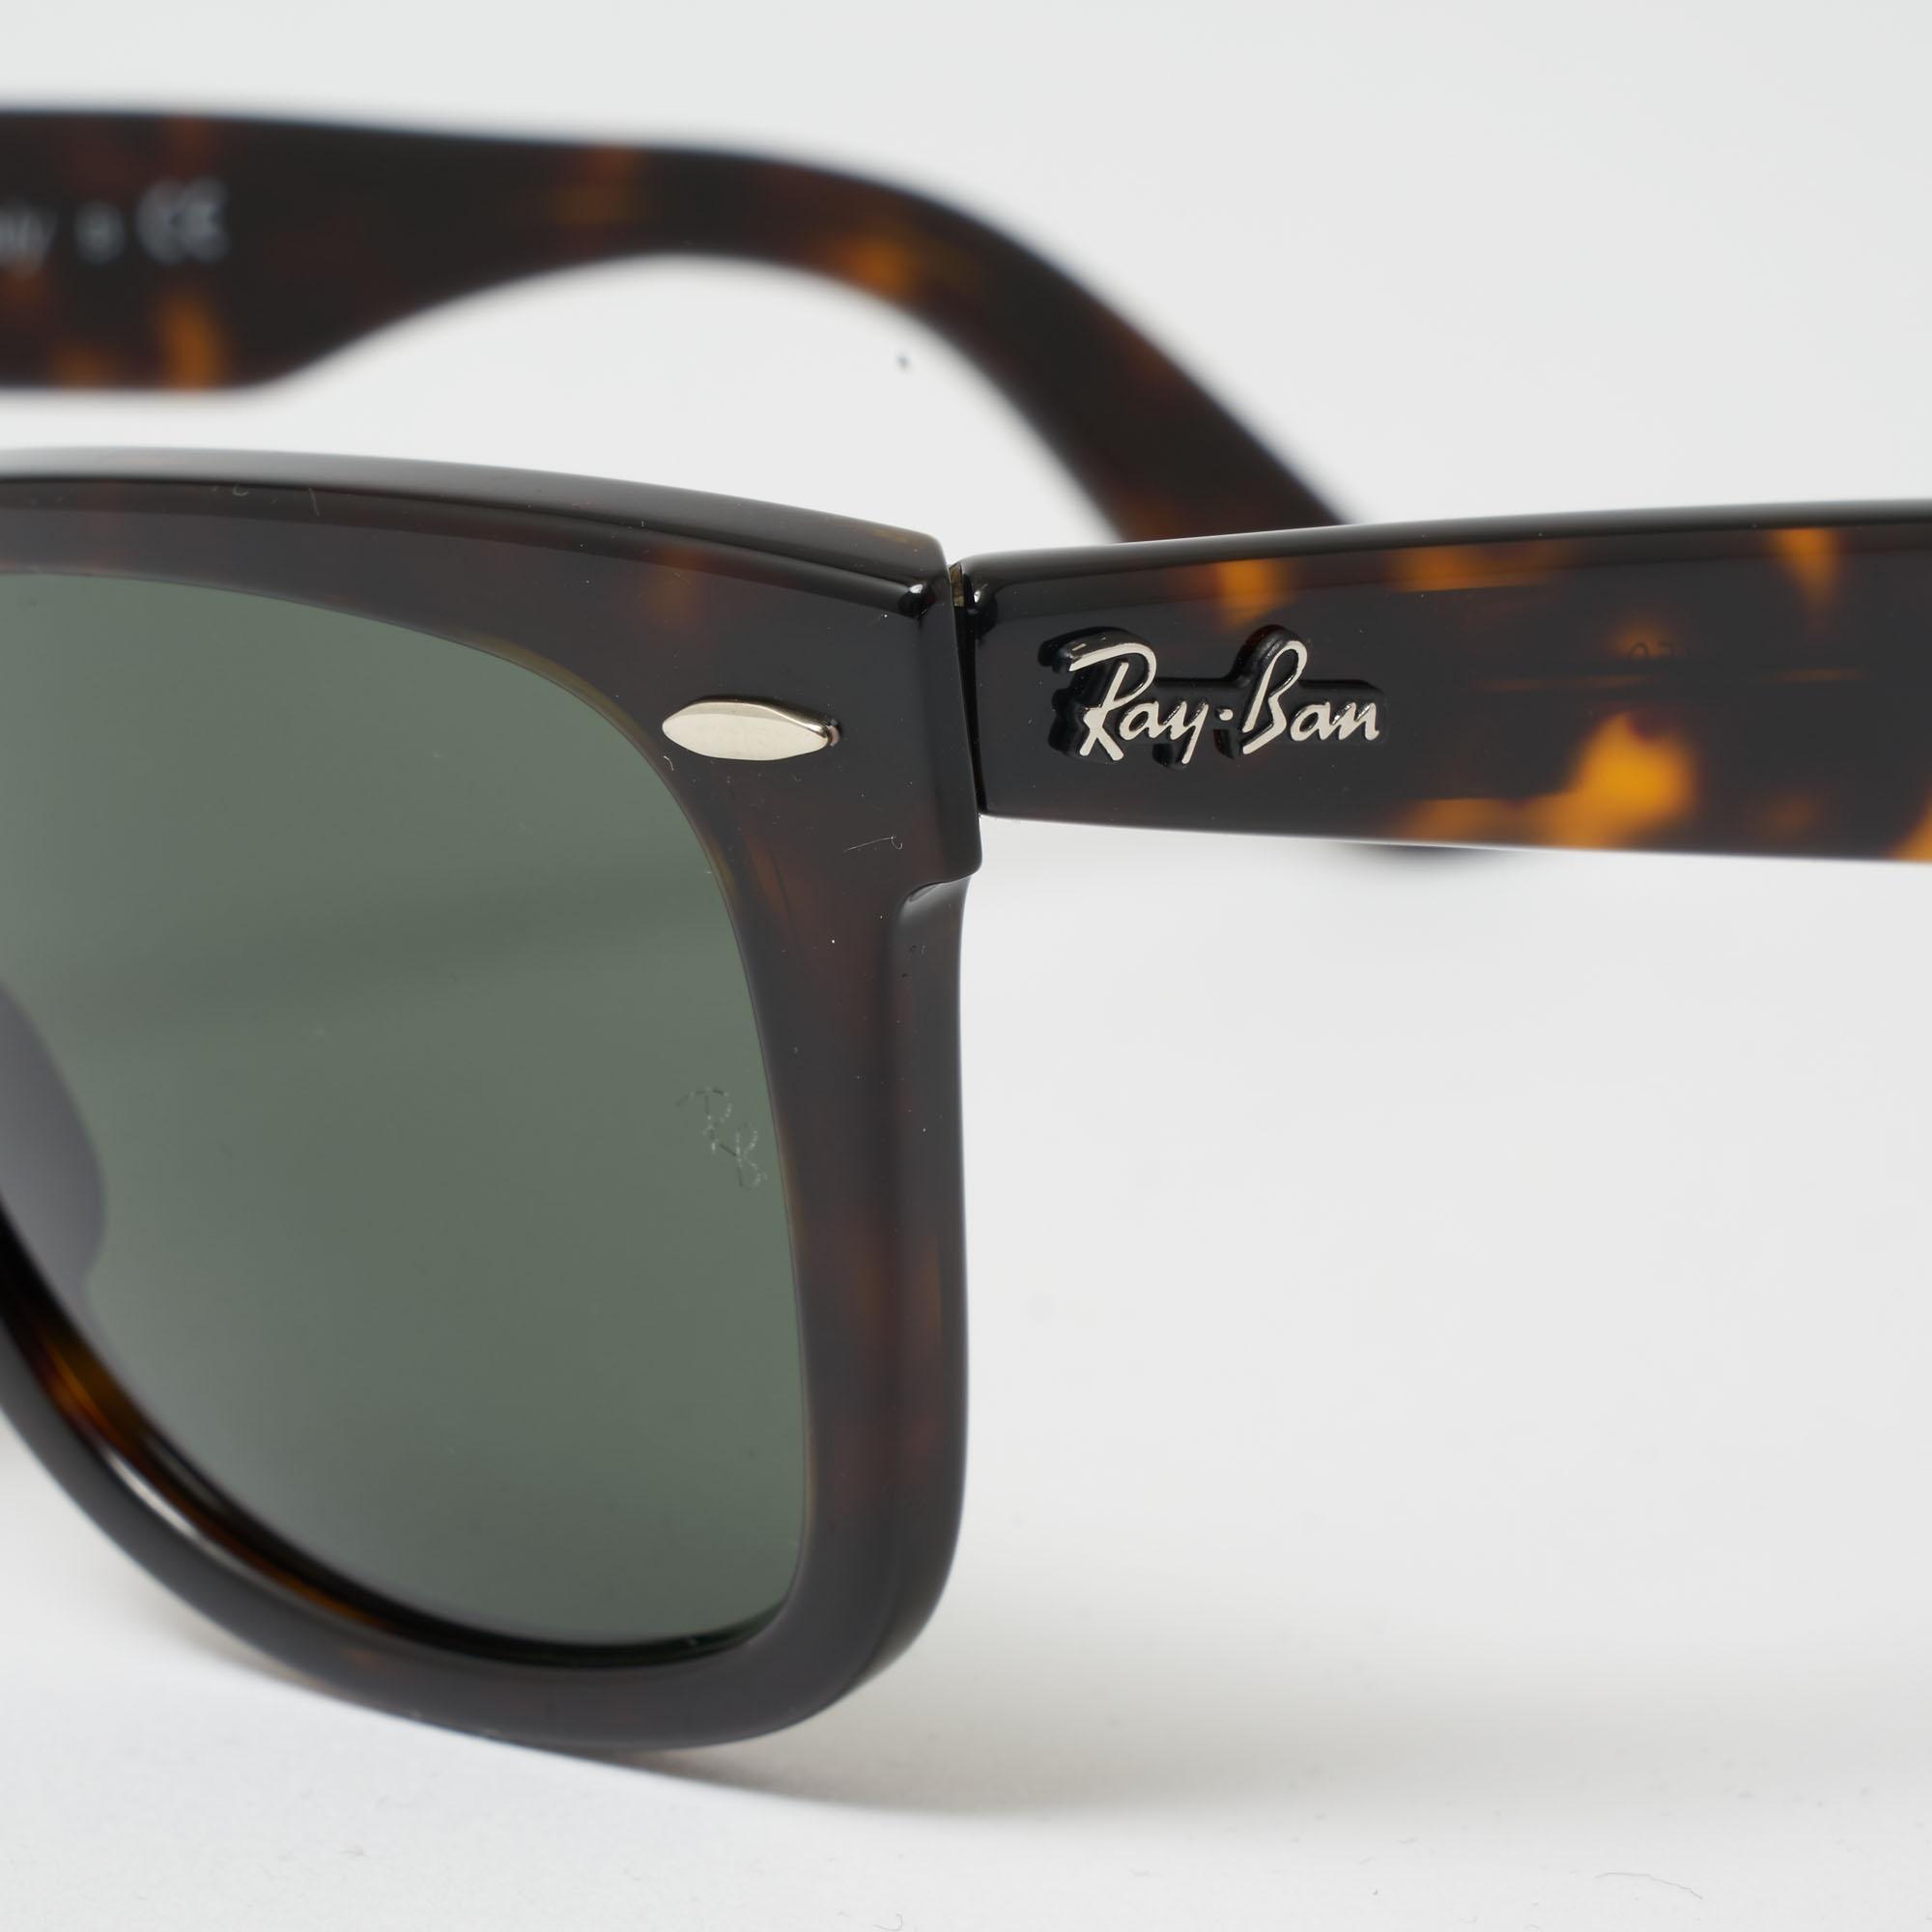 9bde99e91bb0f Ray-Ban - Multicolor Tortoise Original Wayfarer Classic Sunglasses - Green  Classic G-15. View fullscreen